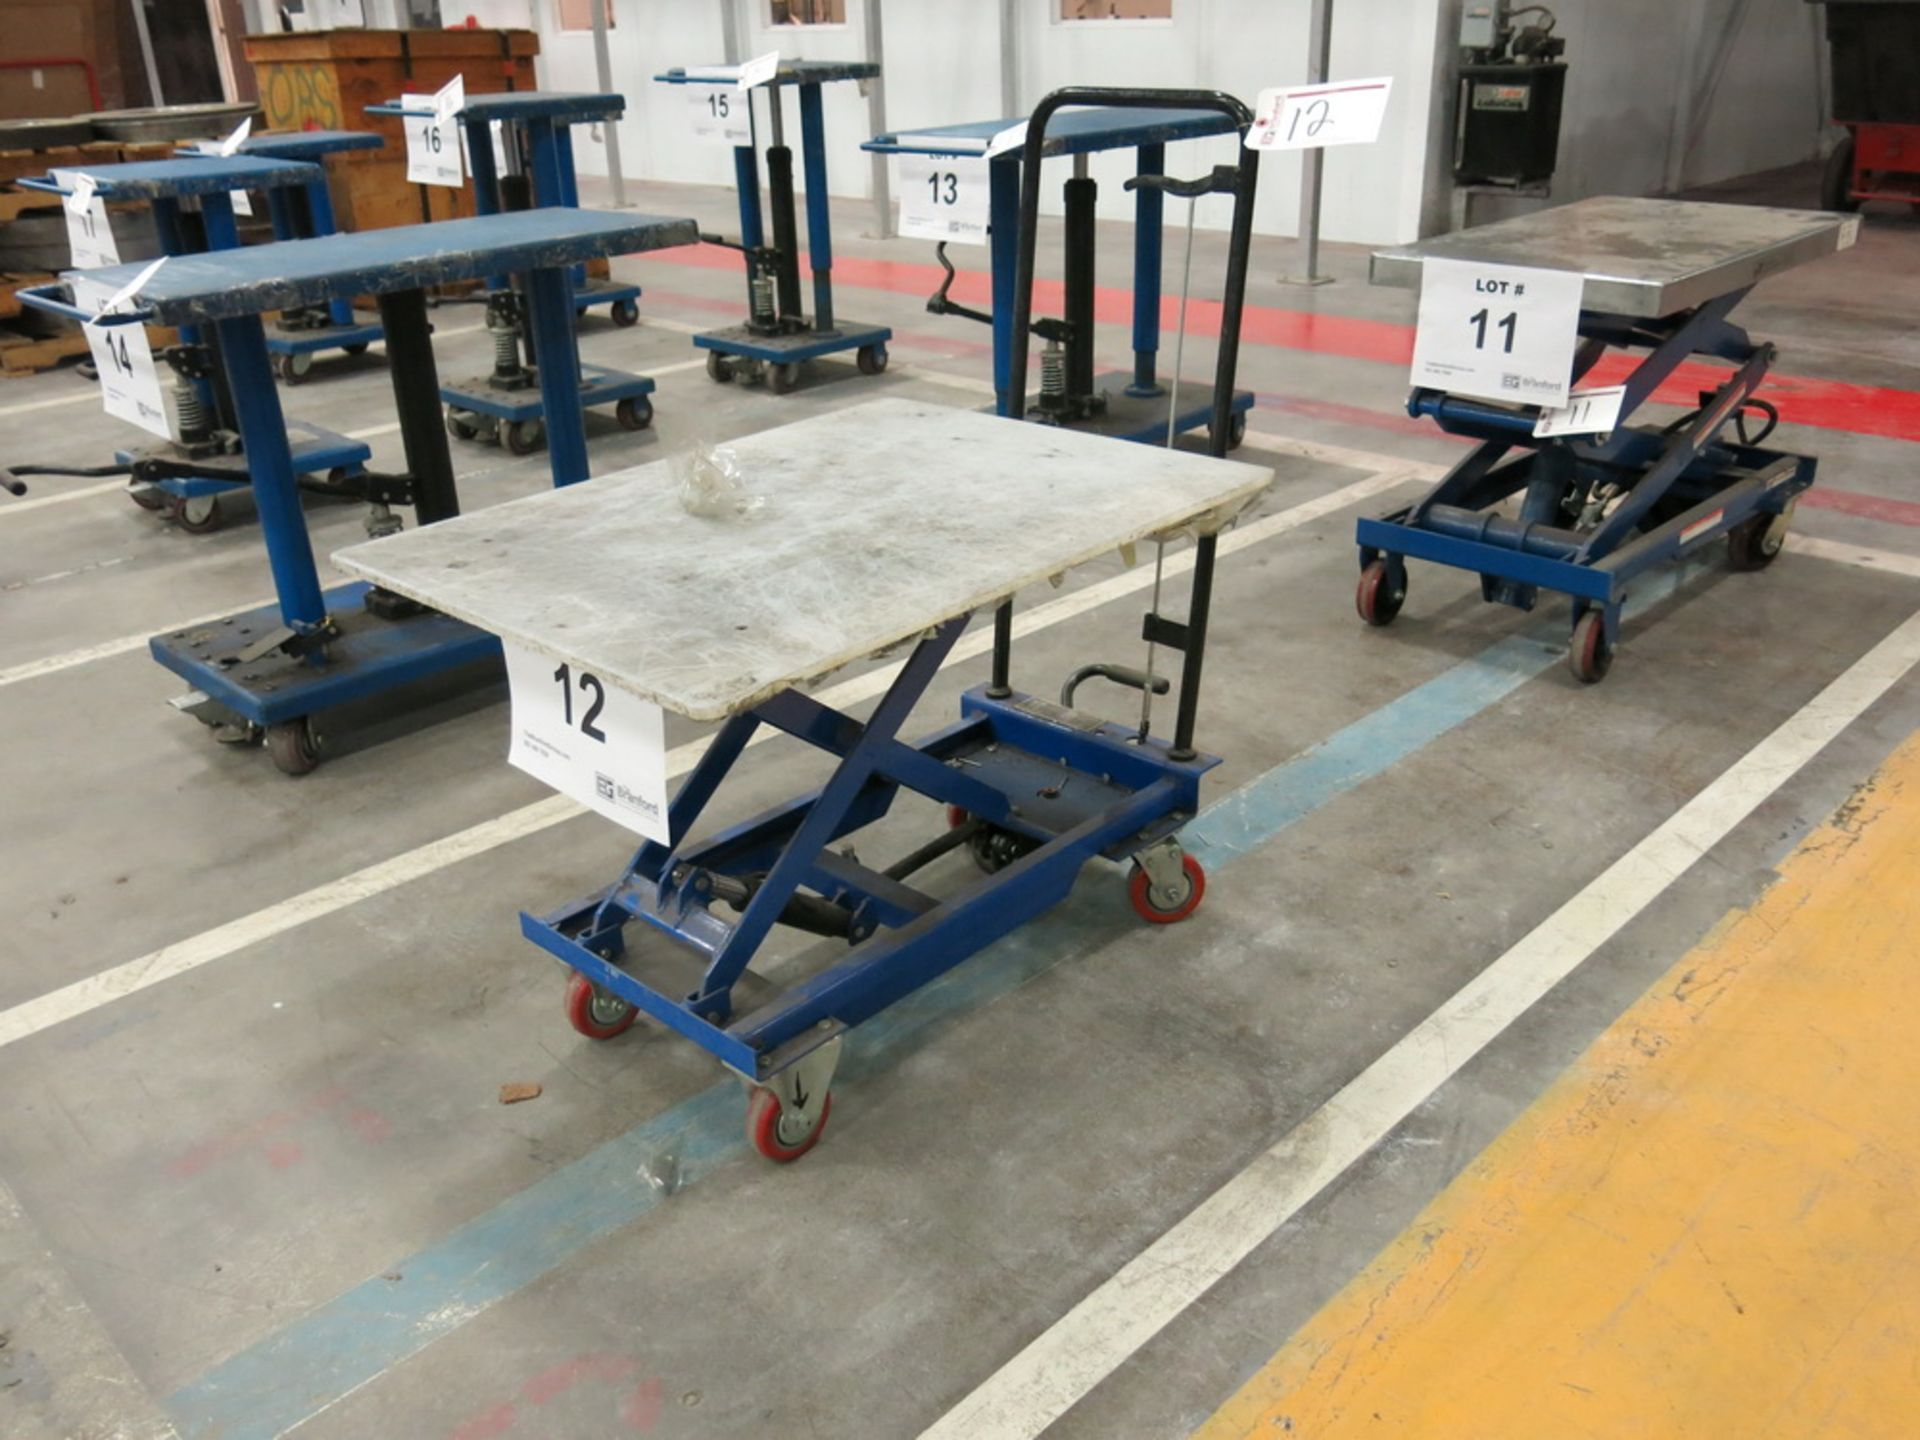 Lot 12 - Lift Table, 450 Lb Cap. Hydraulic Die Lift Cart